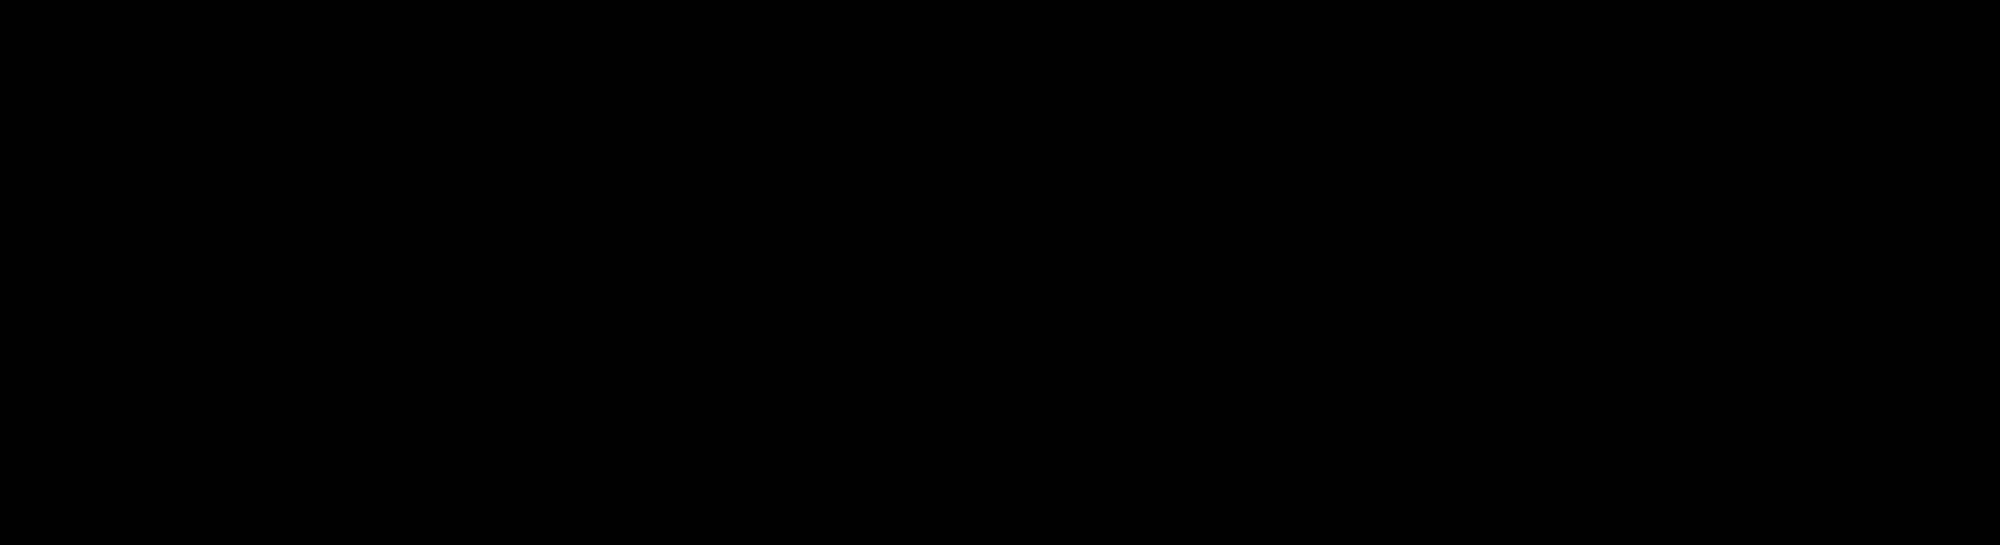 Nathan R. Johnson-logo-black.png